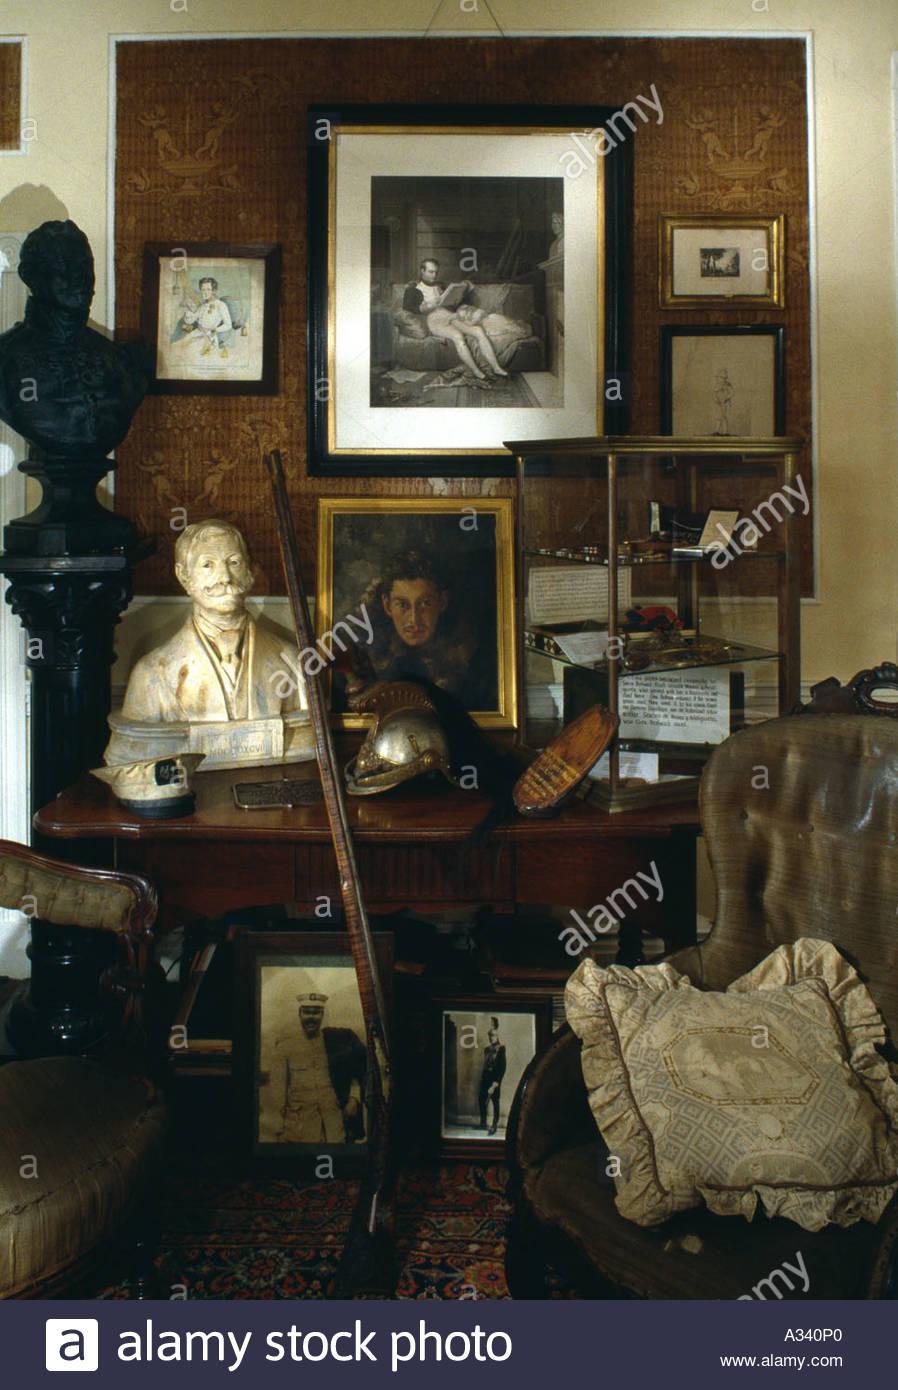 Room of Curiosities. Boal Mansion Museum, Boalsburg, Pennsylvania. - Stock Image